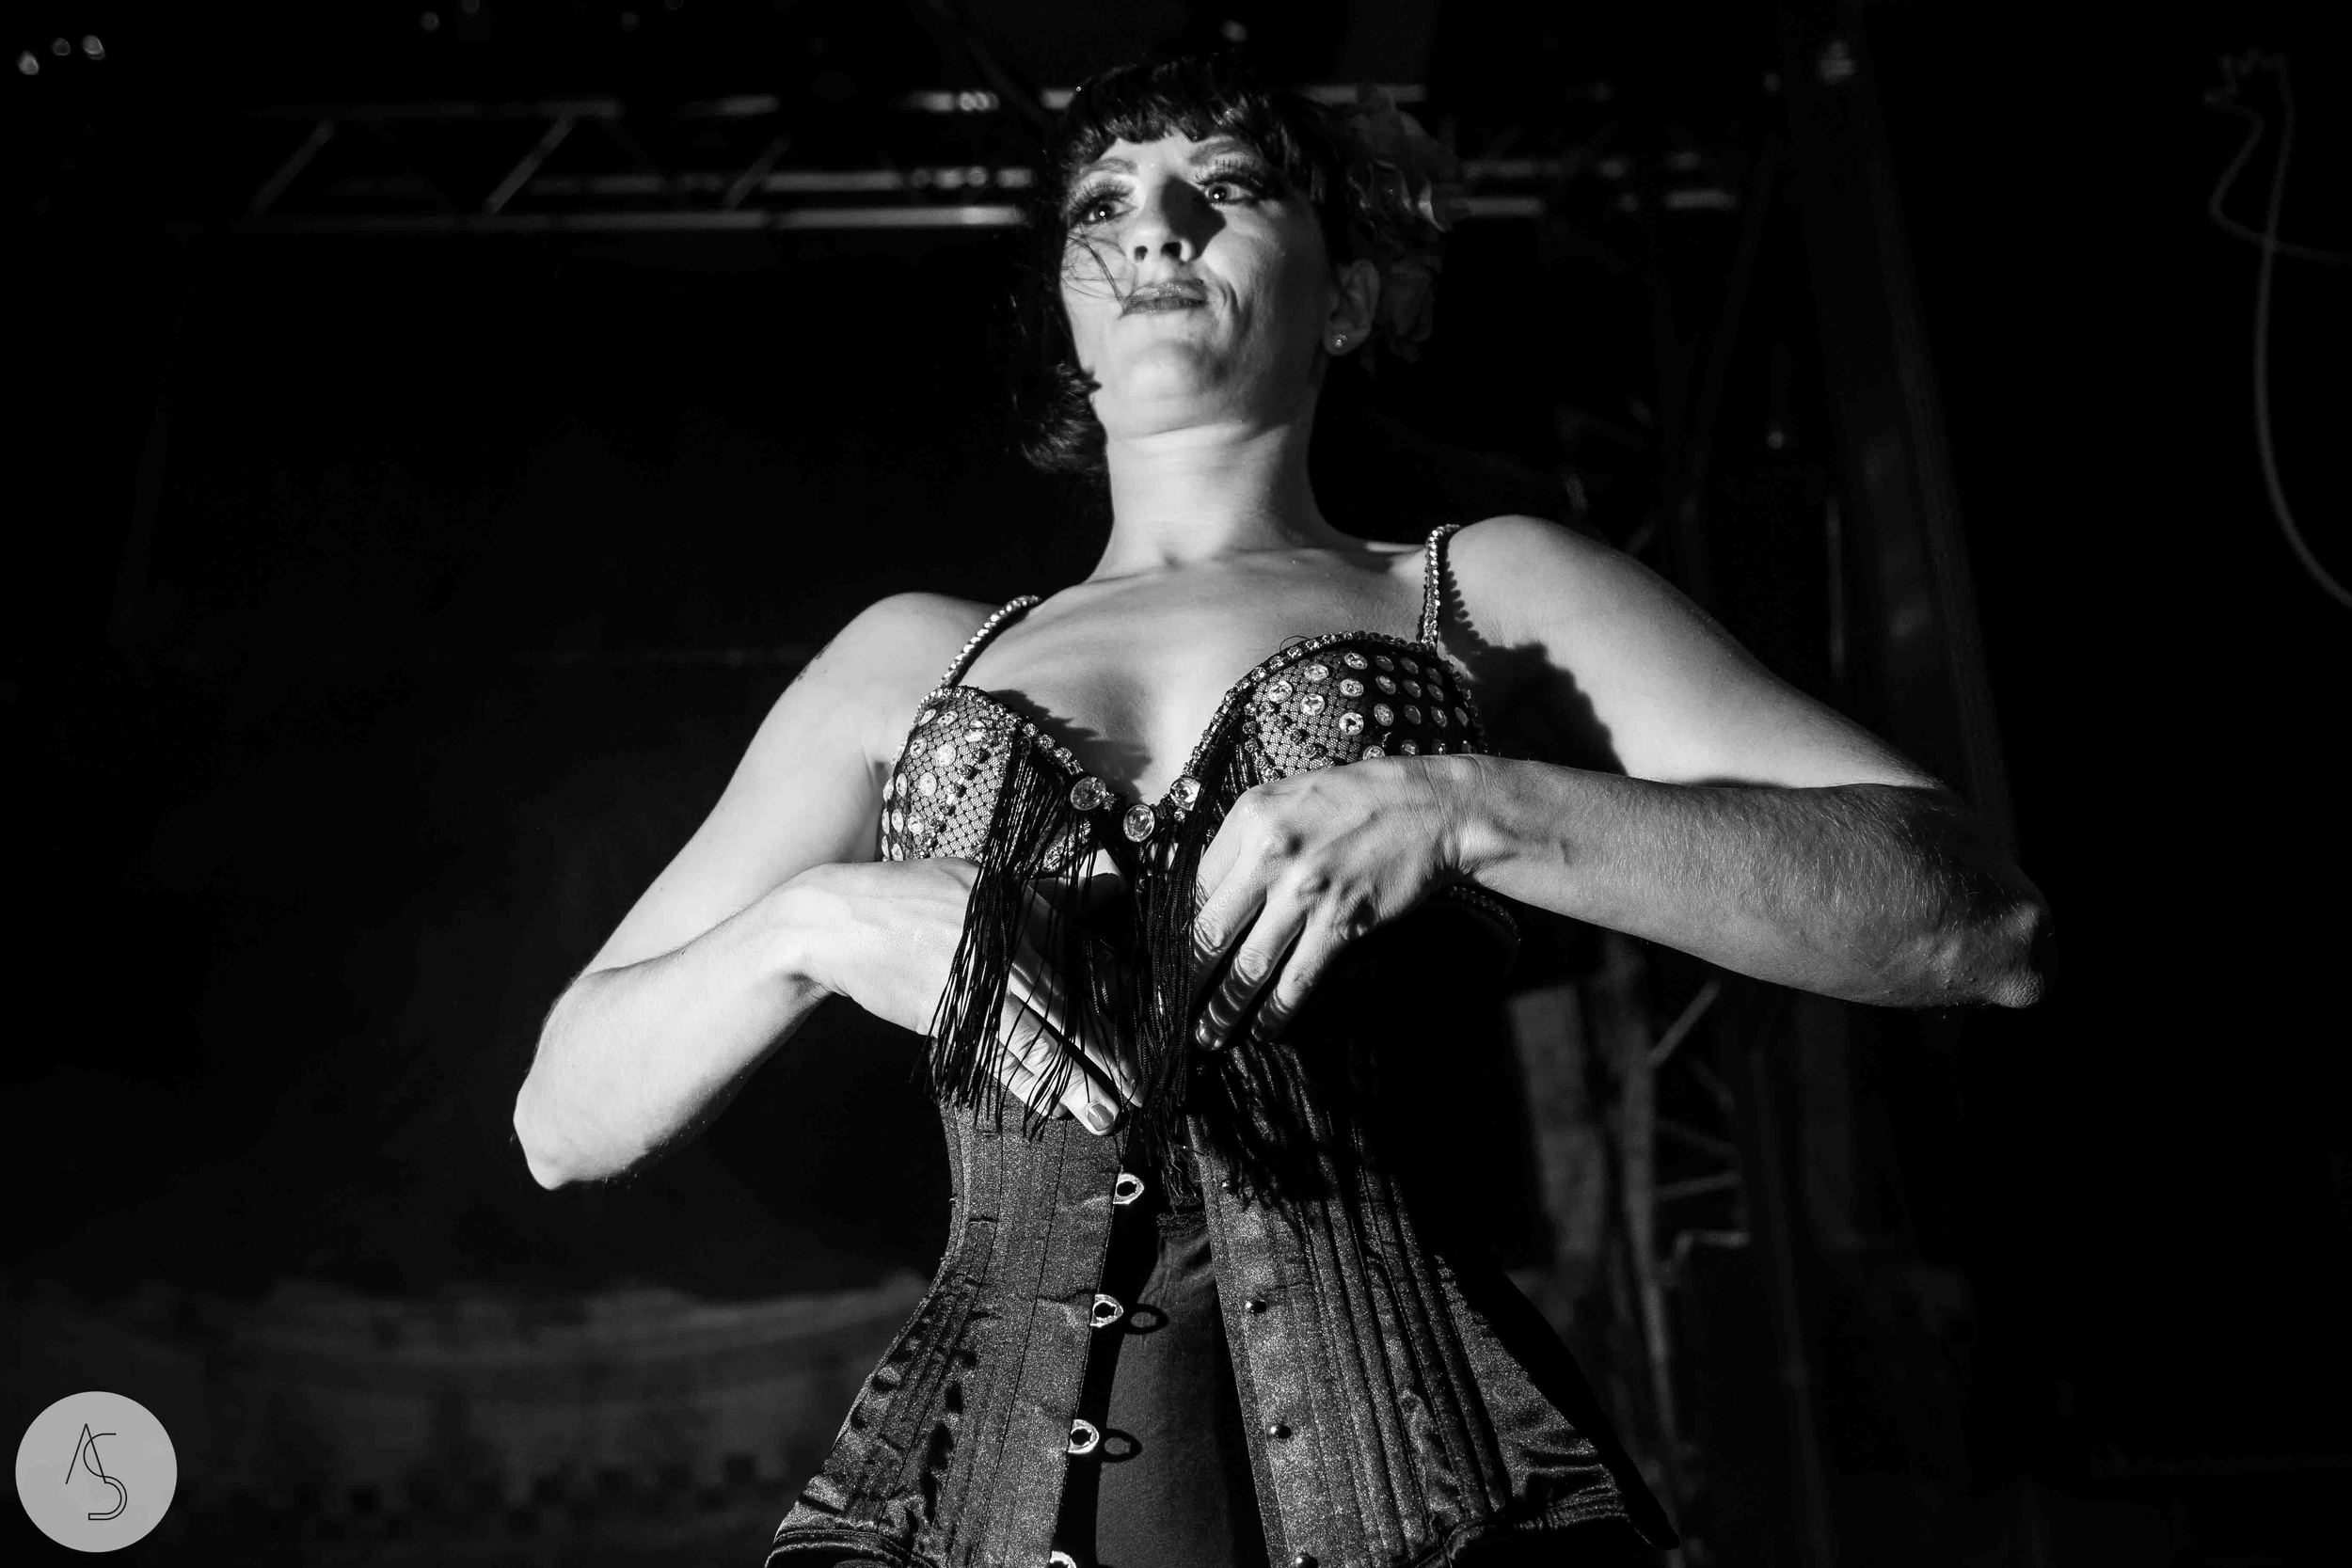 Electroswing cabaret - Ninkasi - Halloween- Adriana Salazar photo - Lyon 001-2.jpg